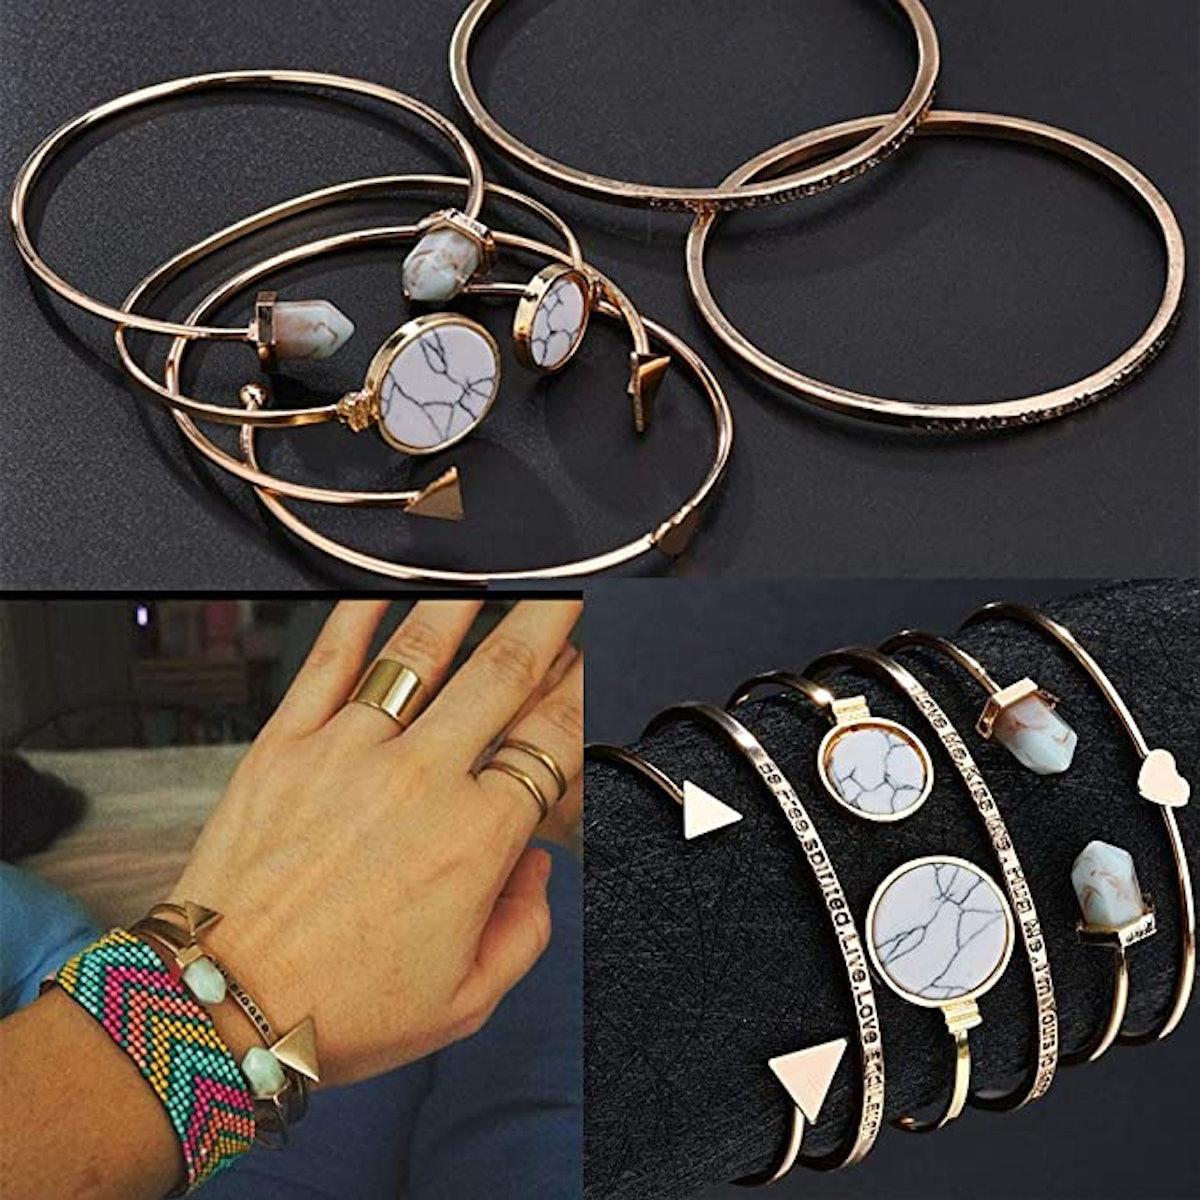 Yunanwa Multiple Layered Stackable Open Cuff Wrap Bangle Bracelets (23pcs)